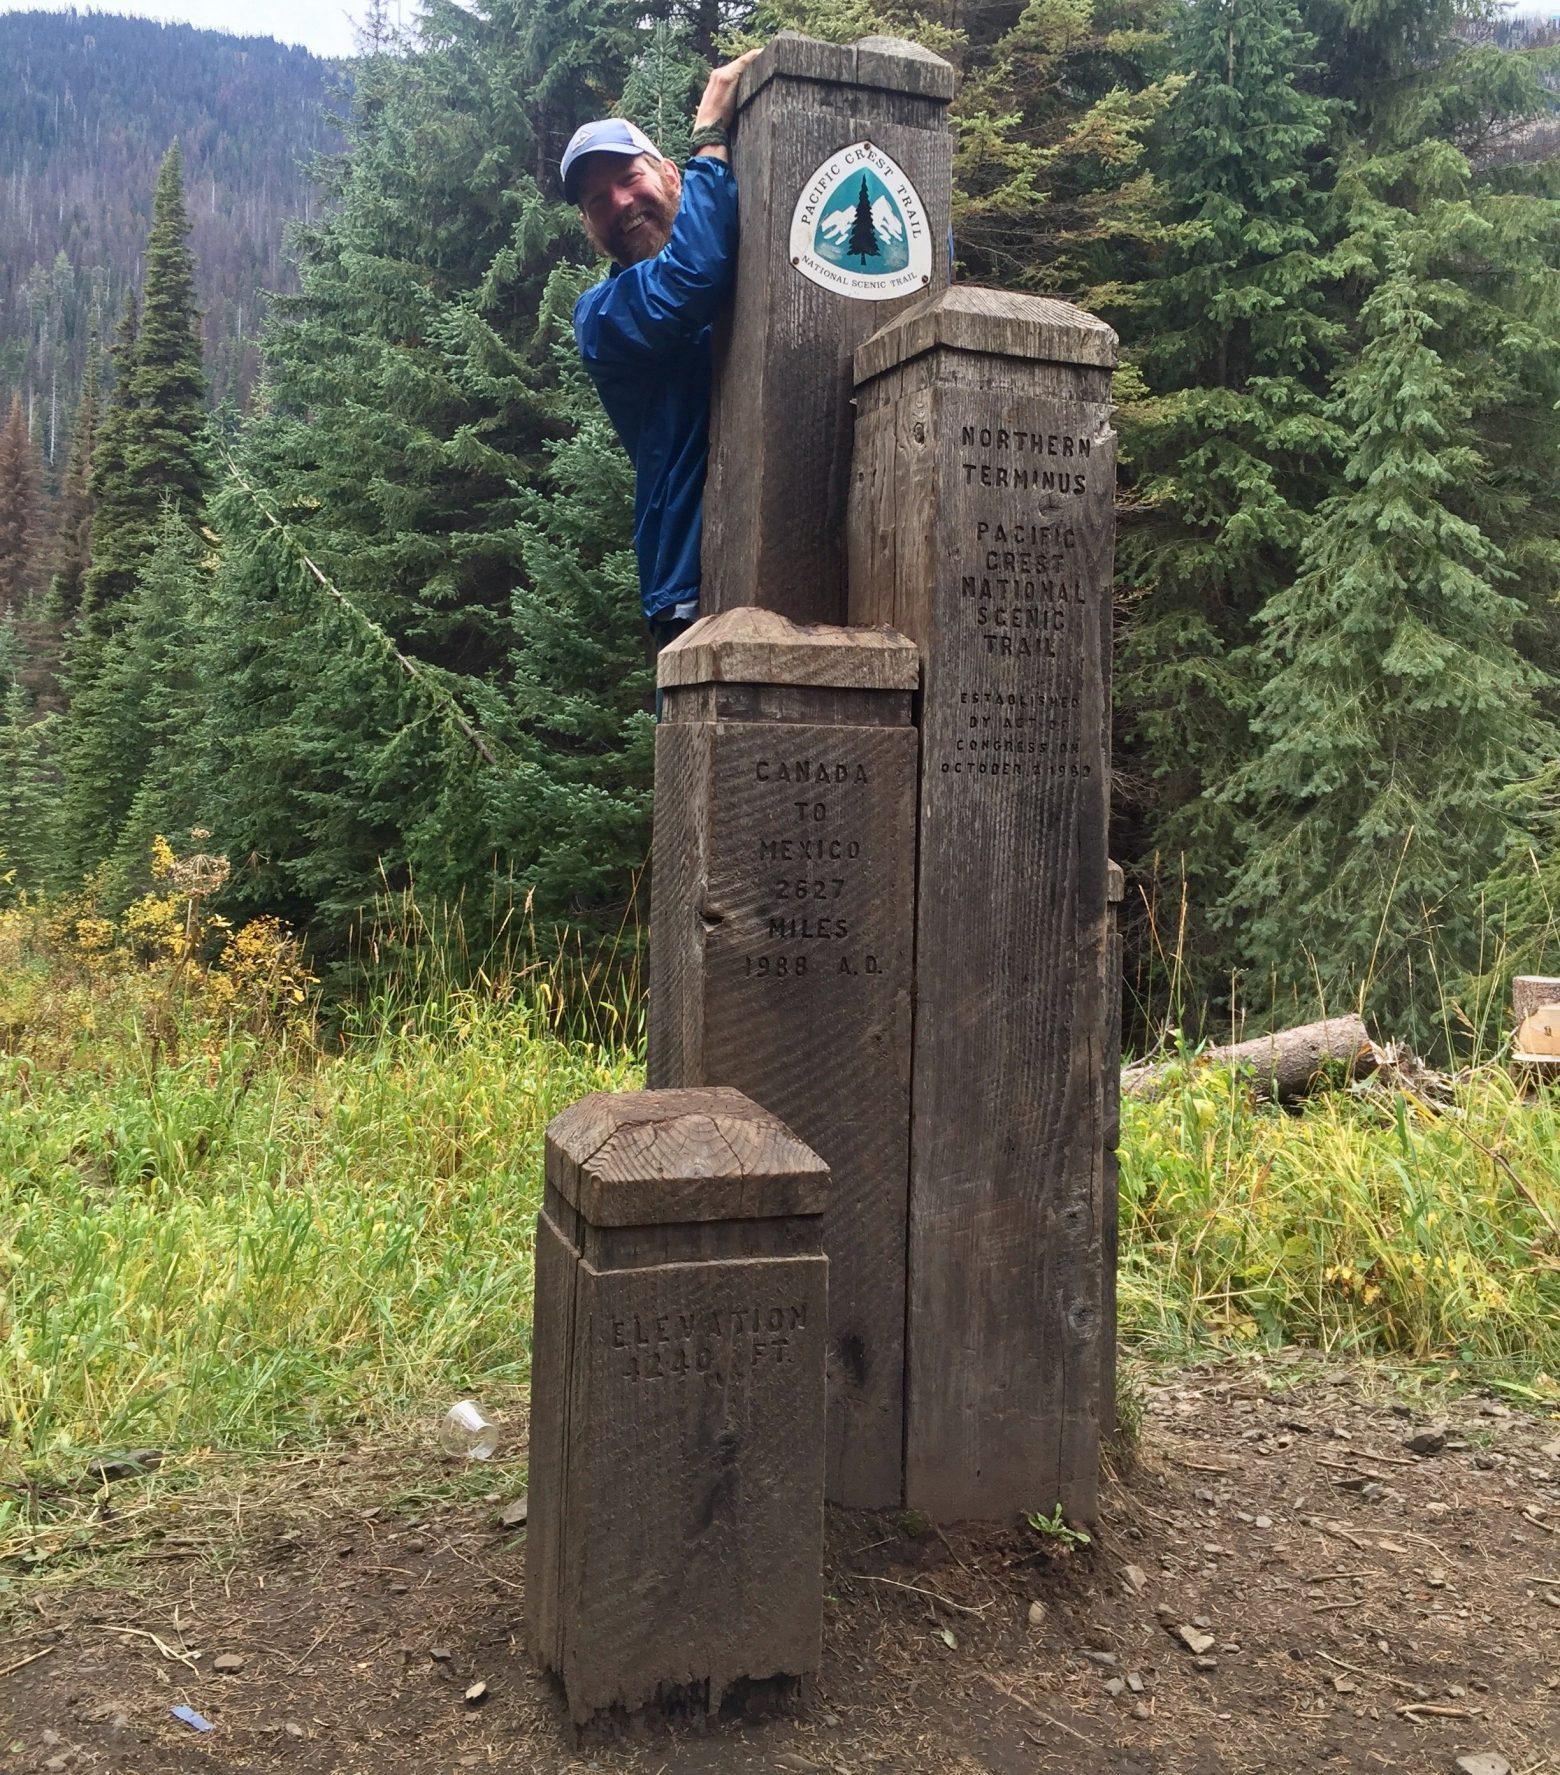 Mountain Man hiding behind wooden border posts at PCT northern terminus